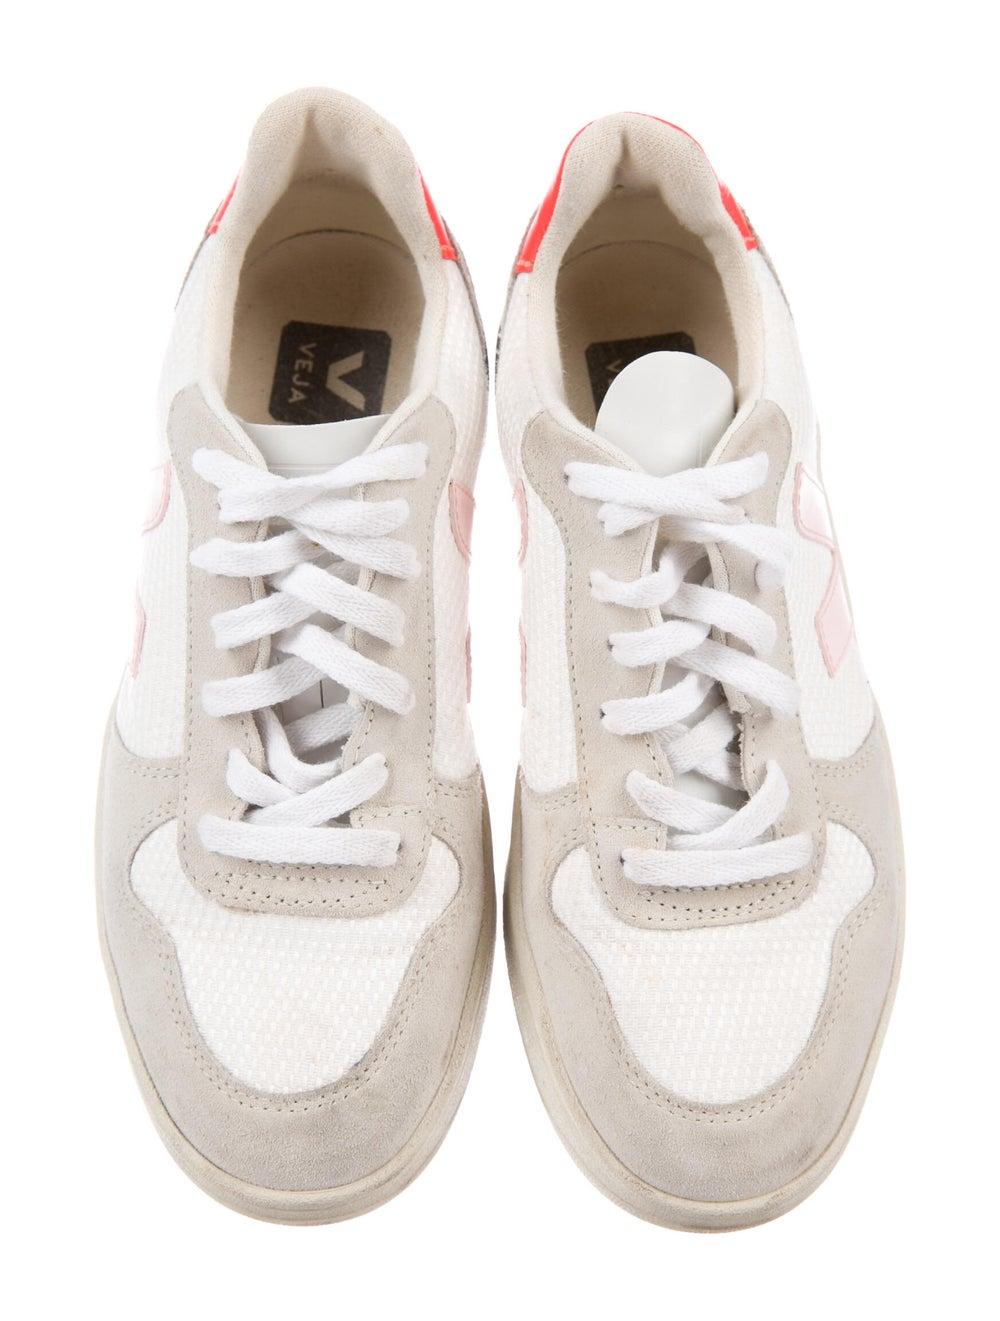 Veja Graphic Print Sneakers - image 3